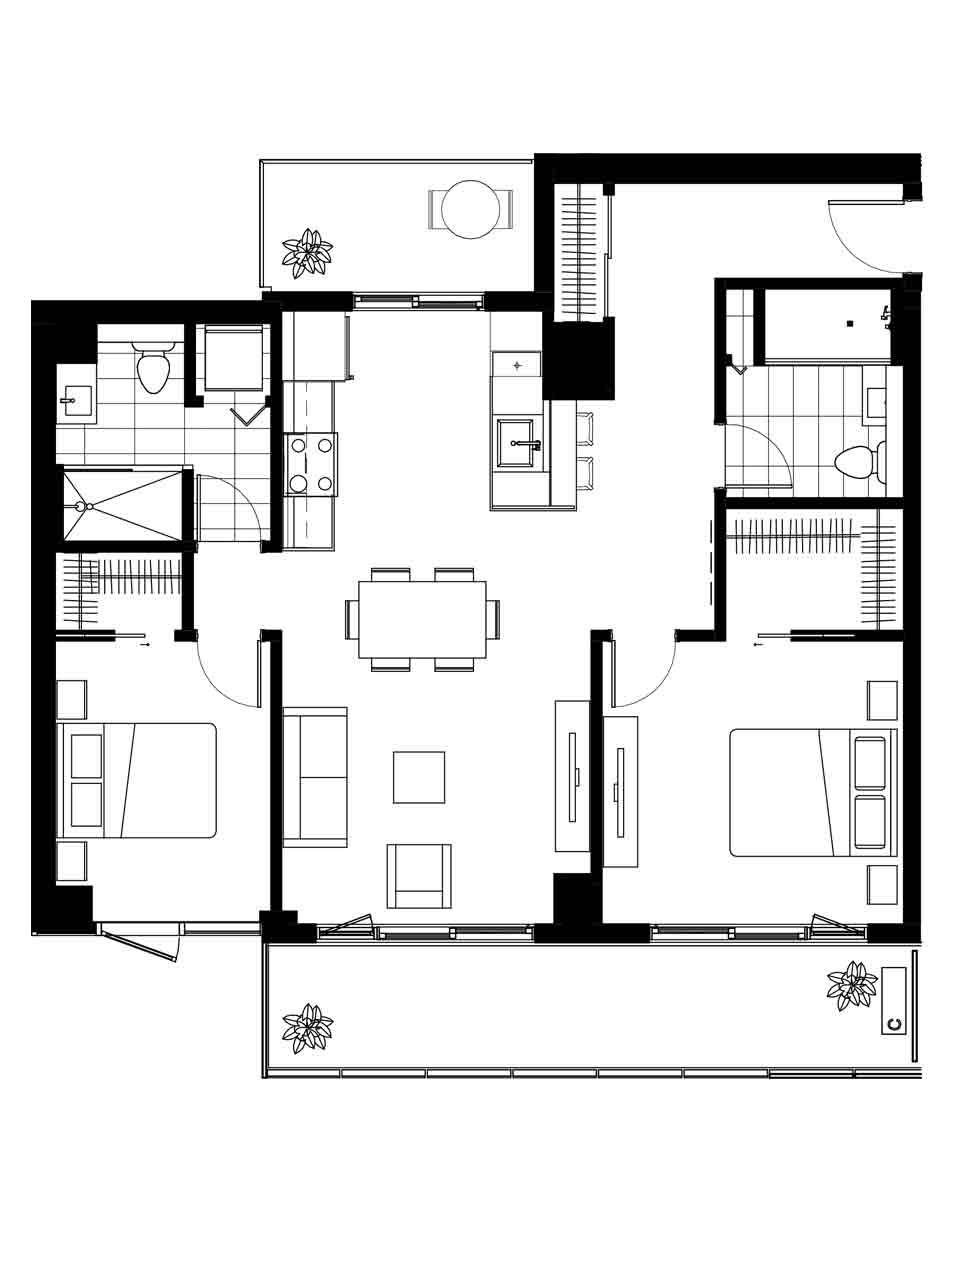 Plan condo modele B.3